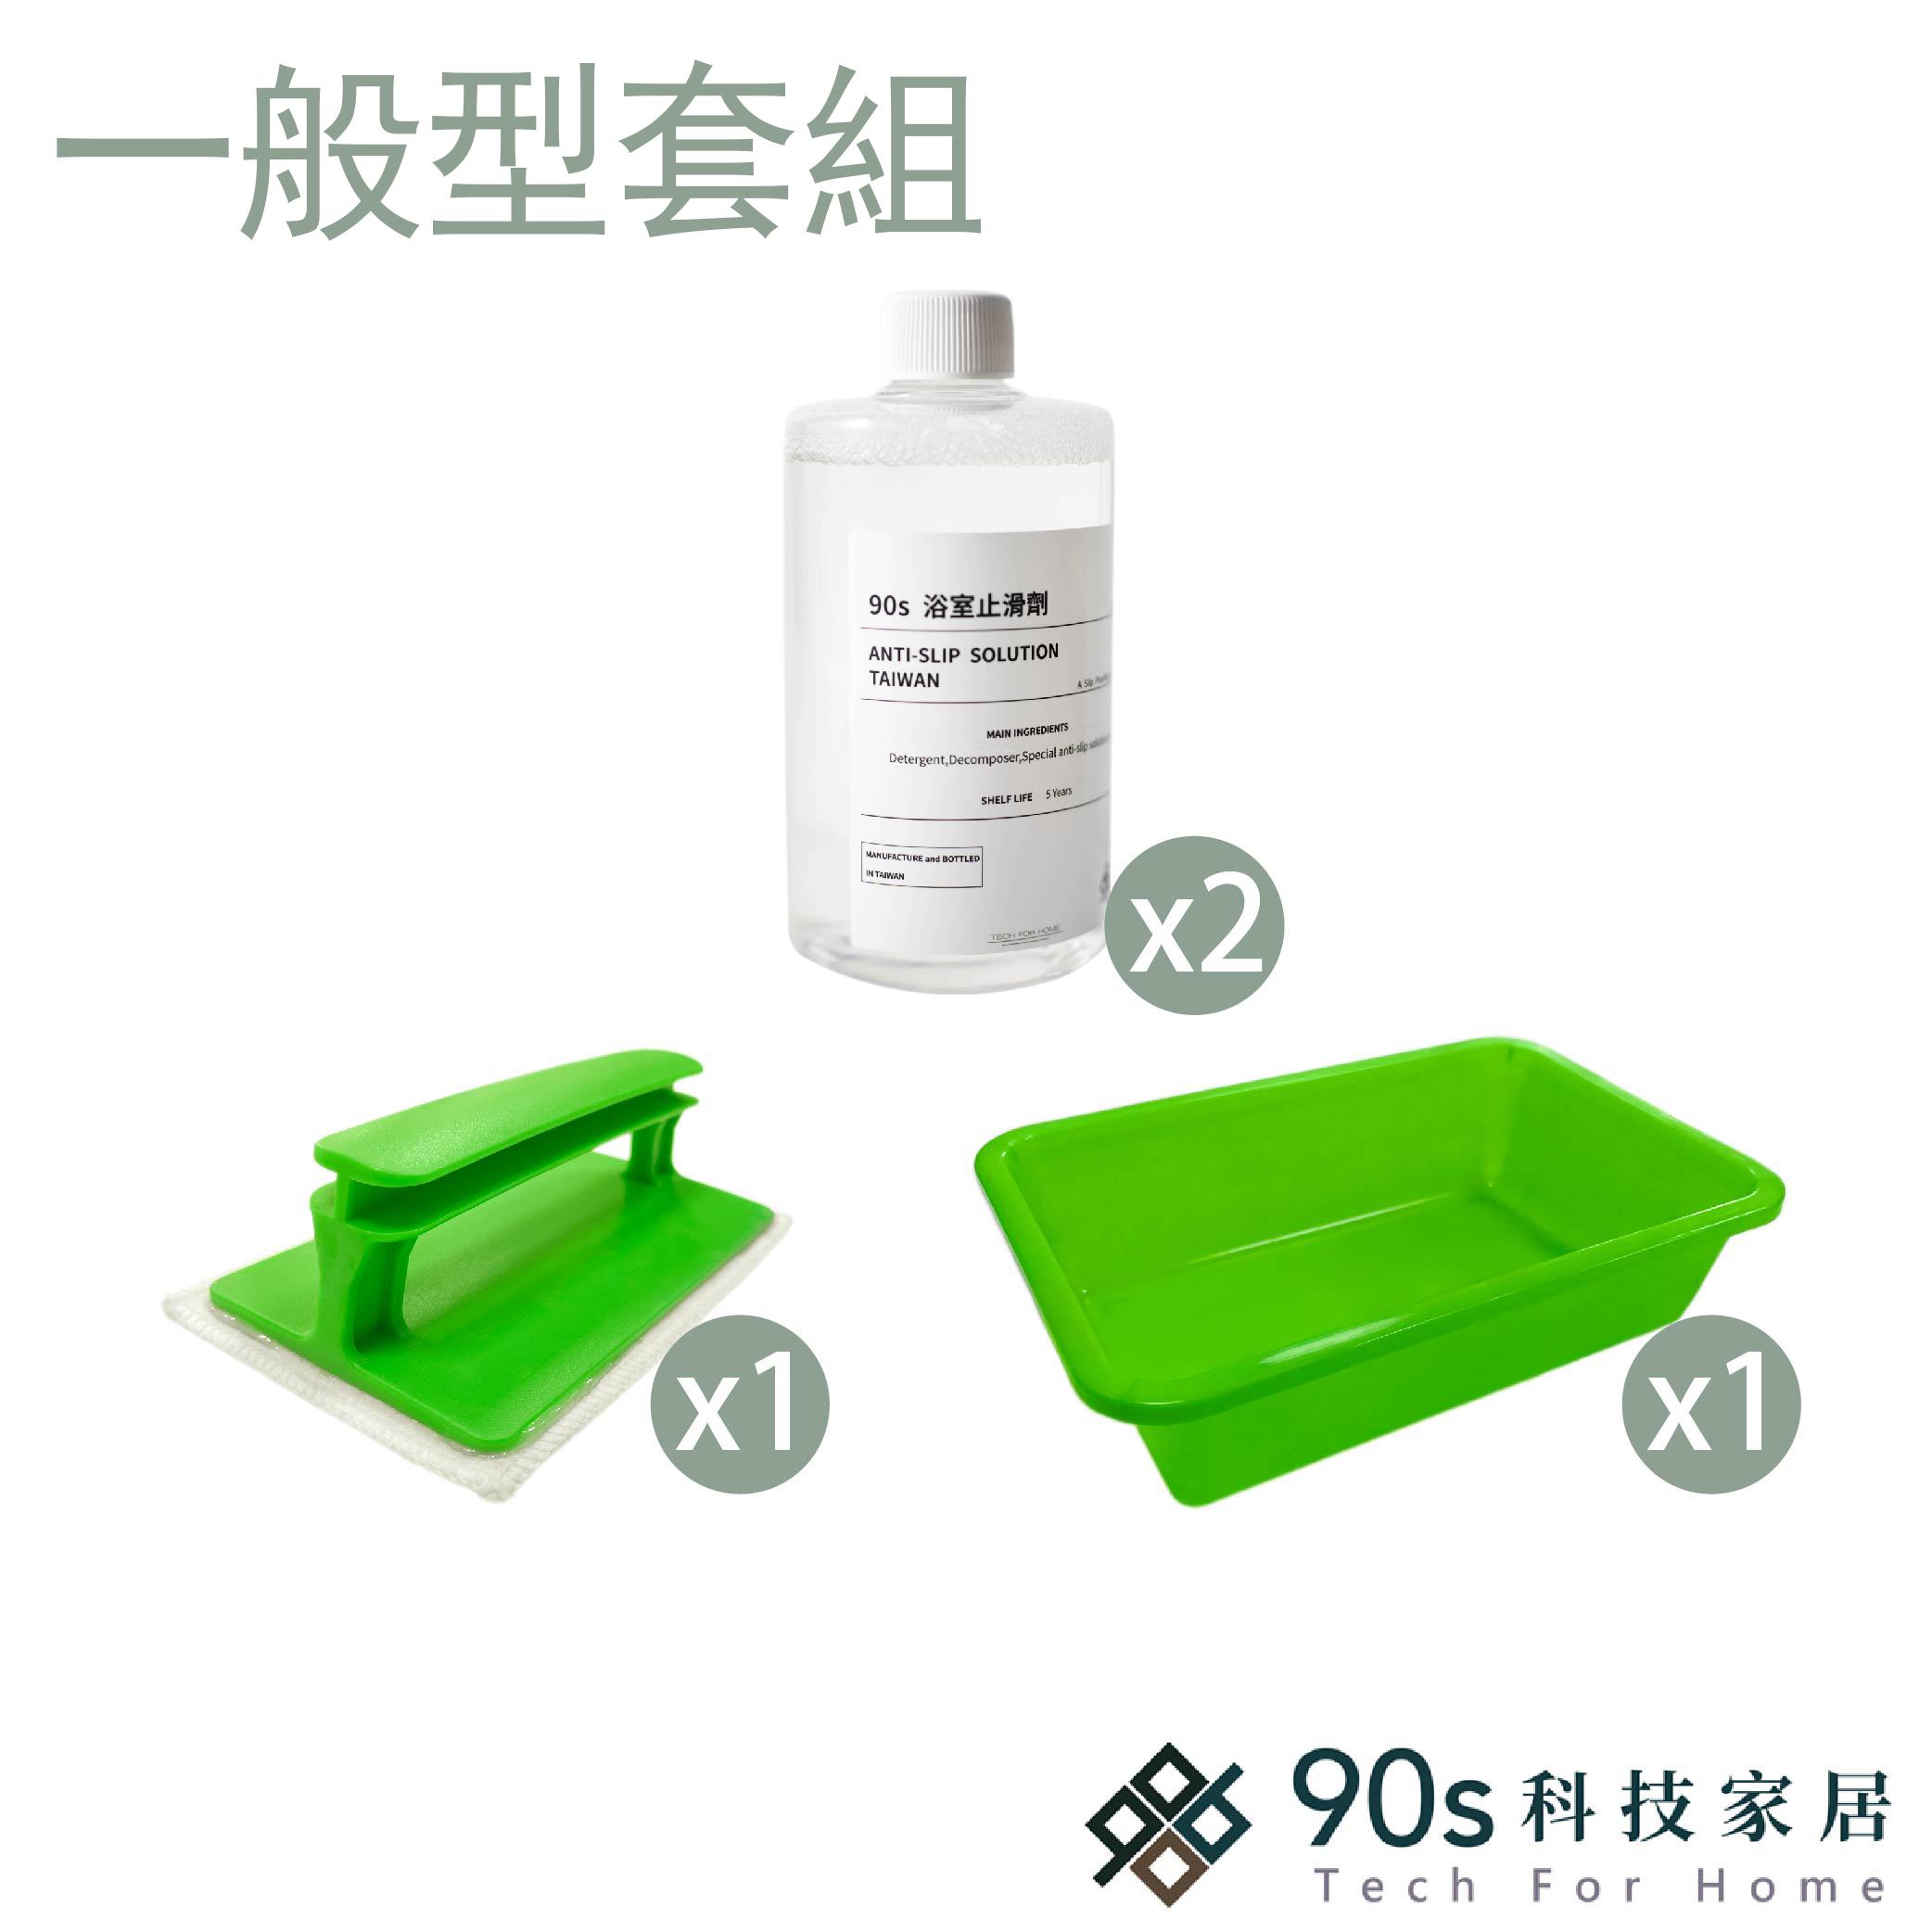 【90s科技家居】浴室止滑劑套組